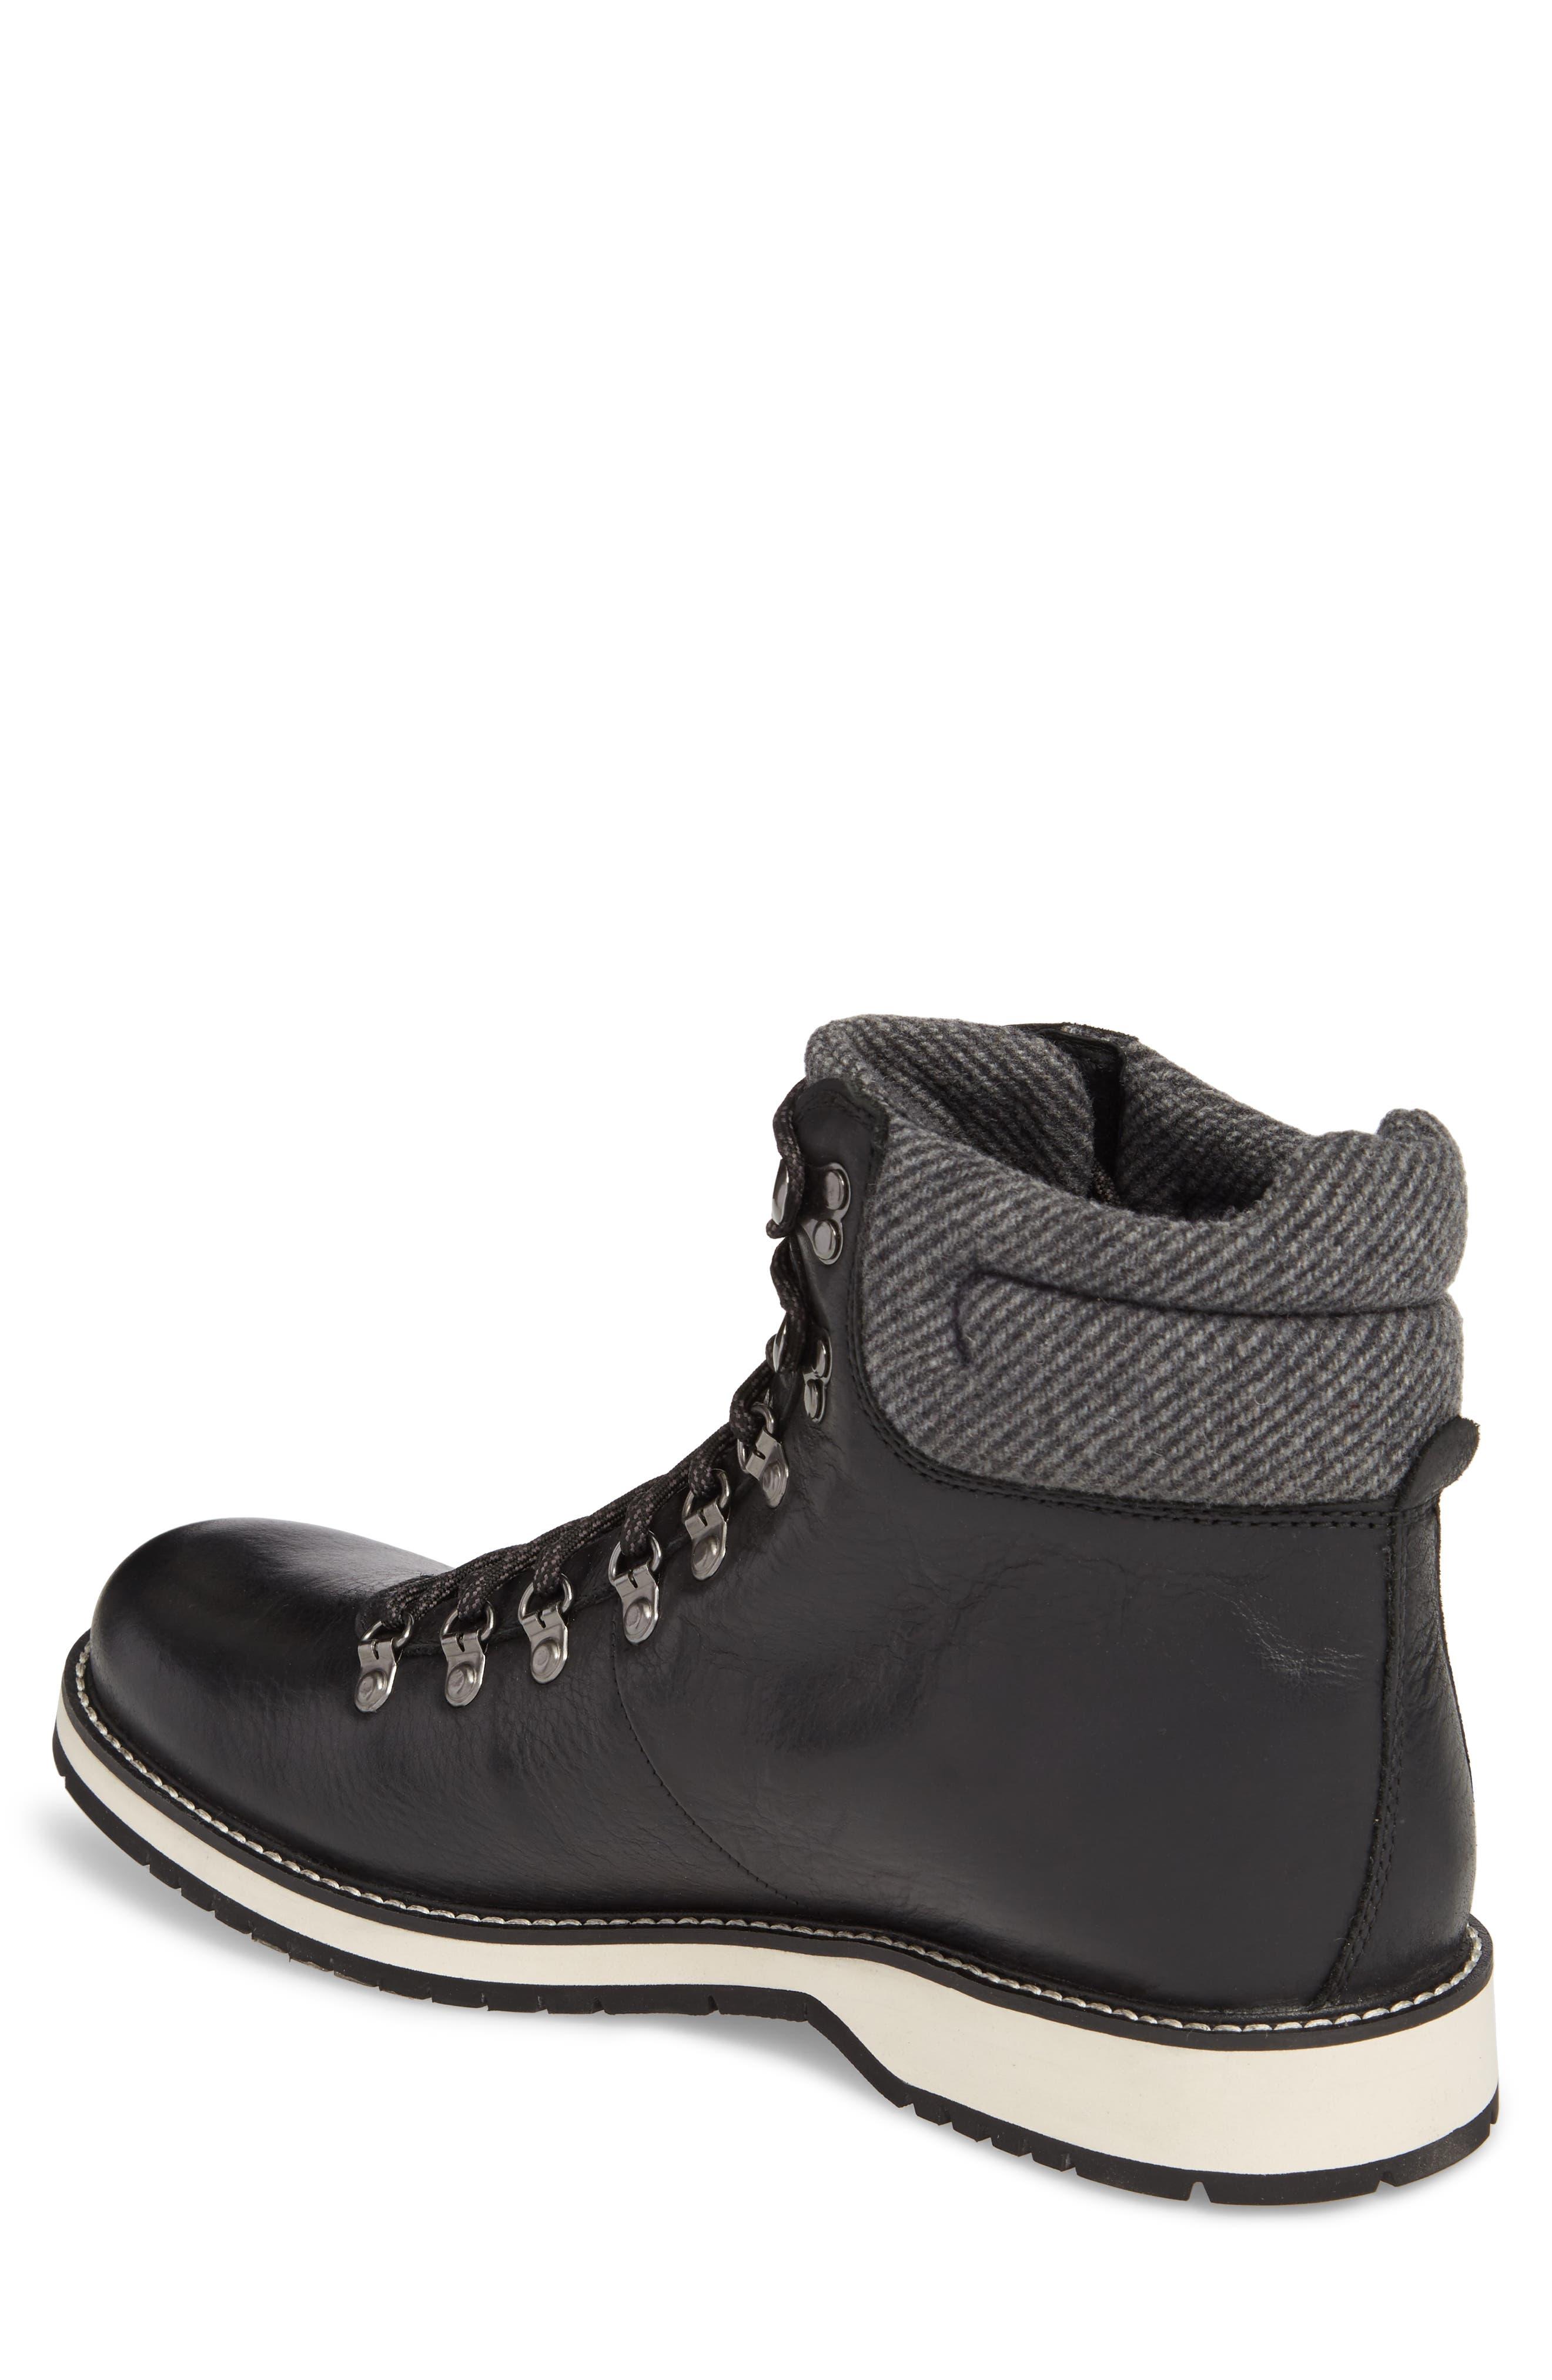 Sidney Waterproof Plain Toe Boot,                             Alternate thumbnail 2, color,                             001